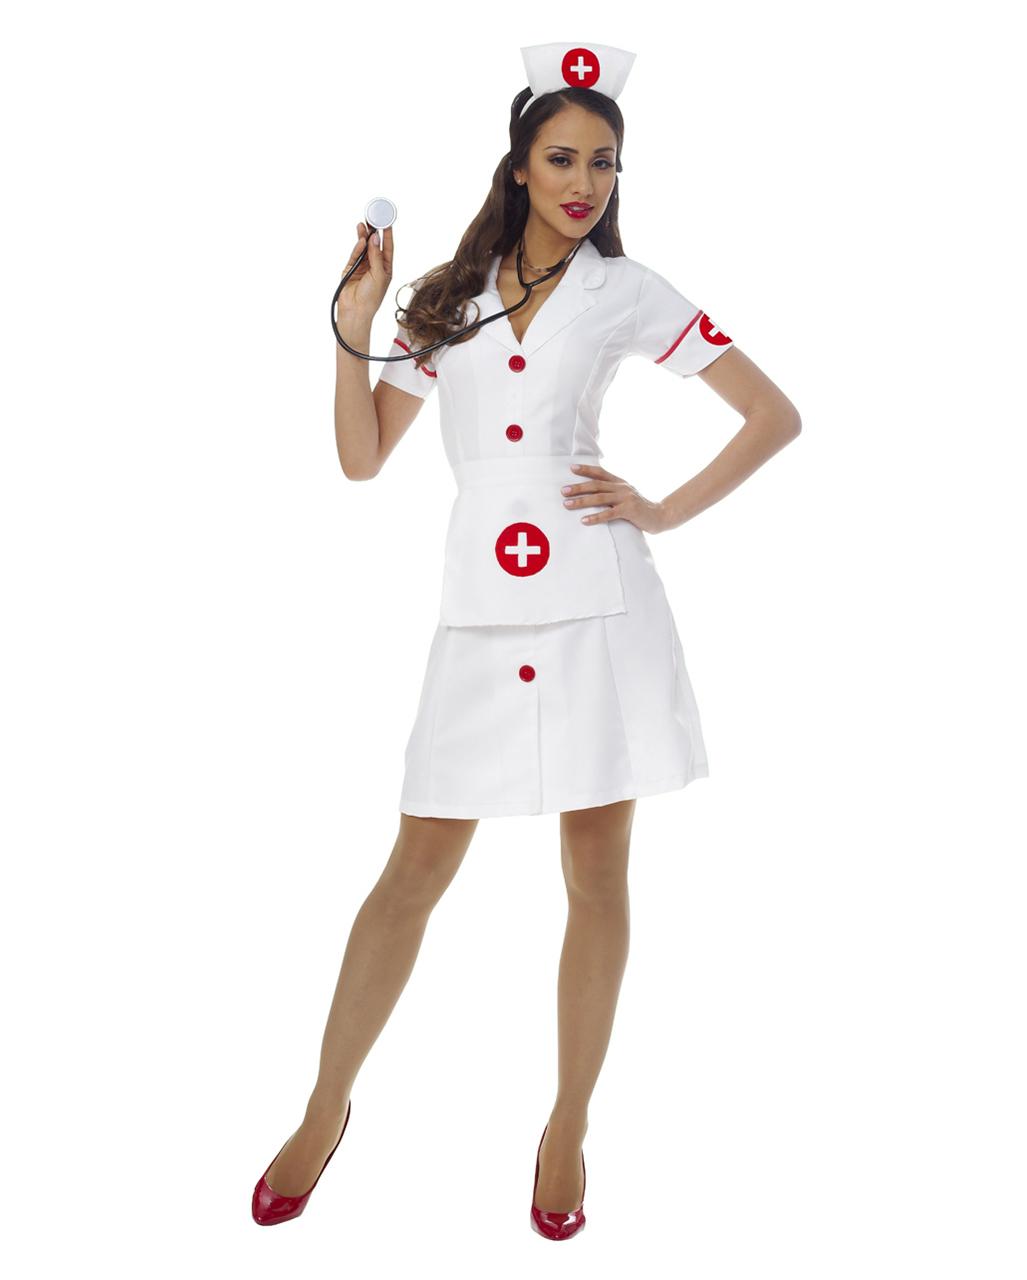 hot-girl-nurses